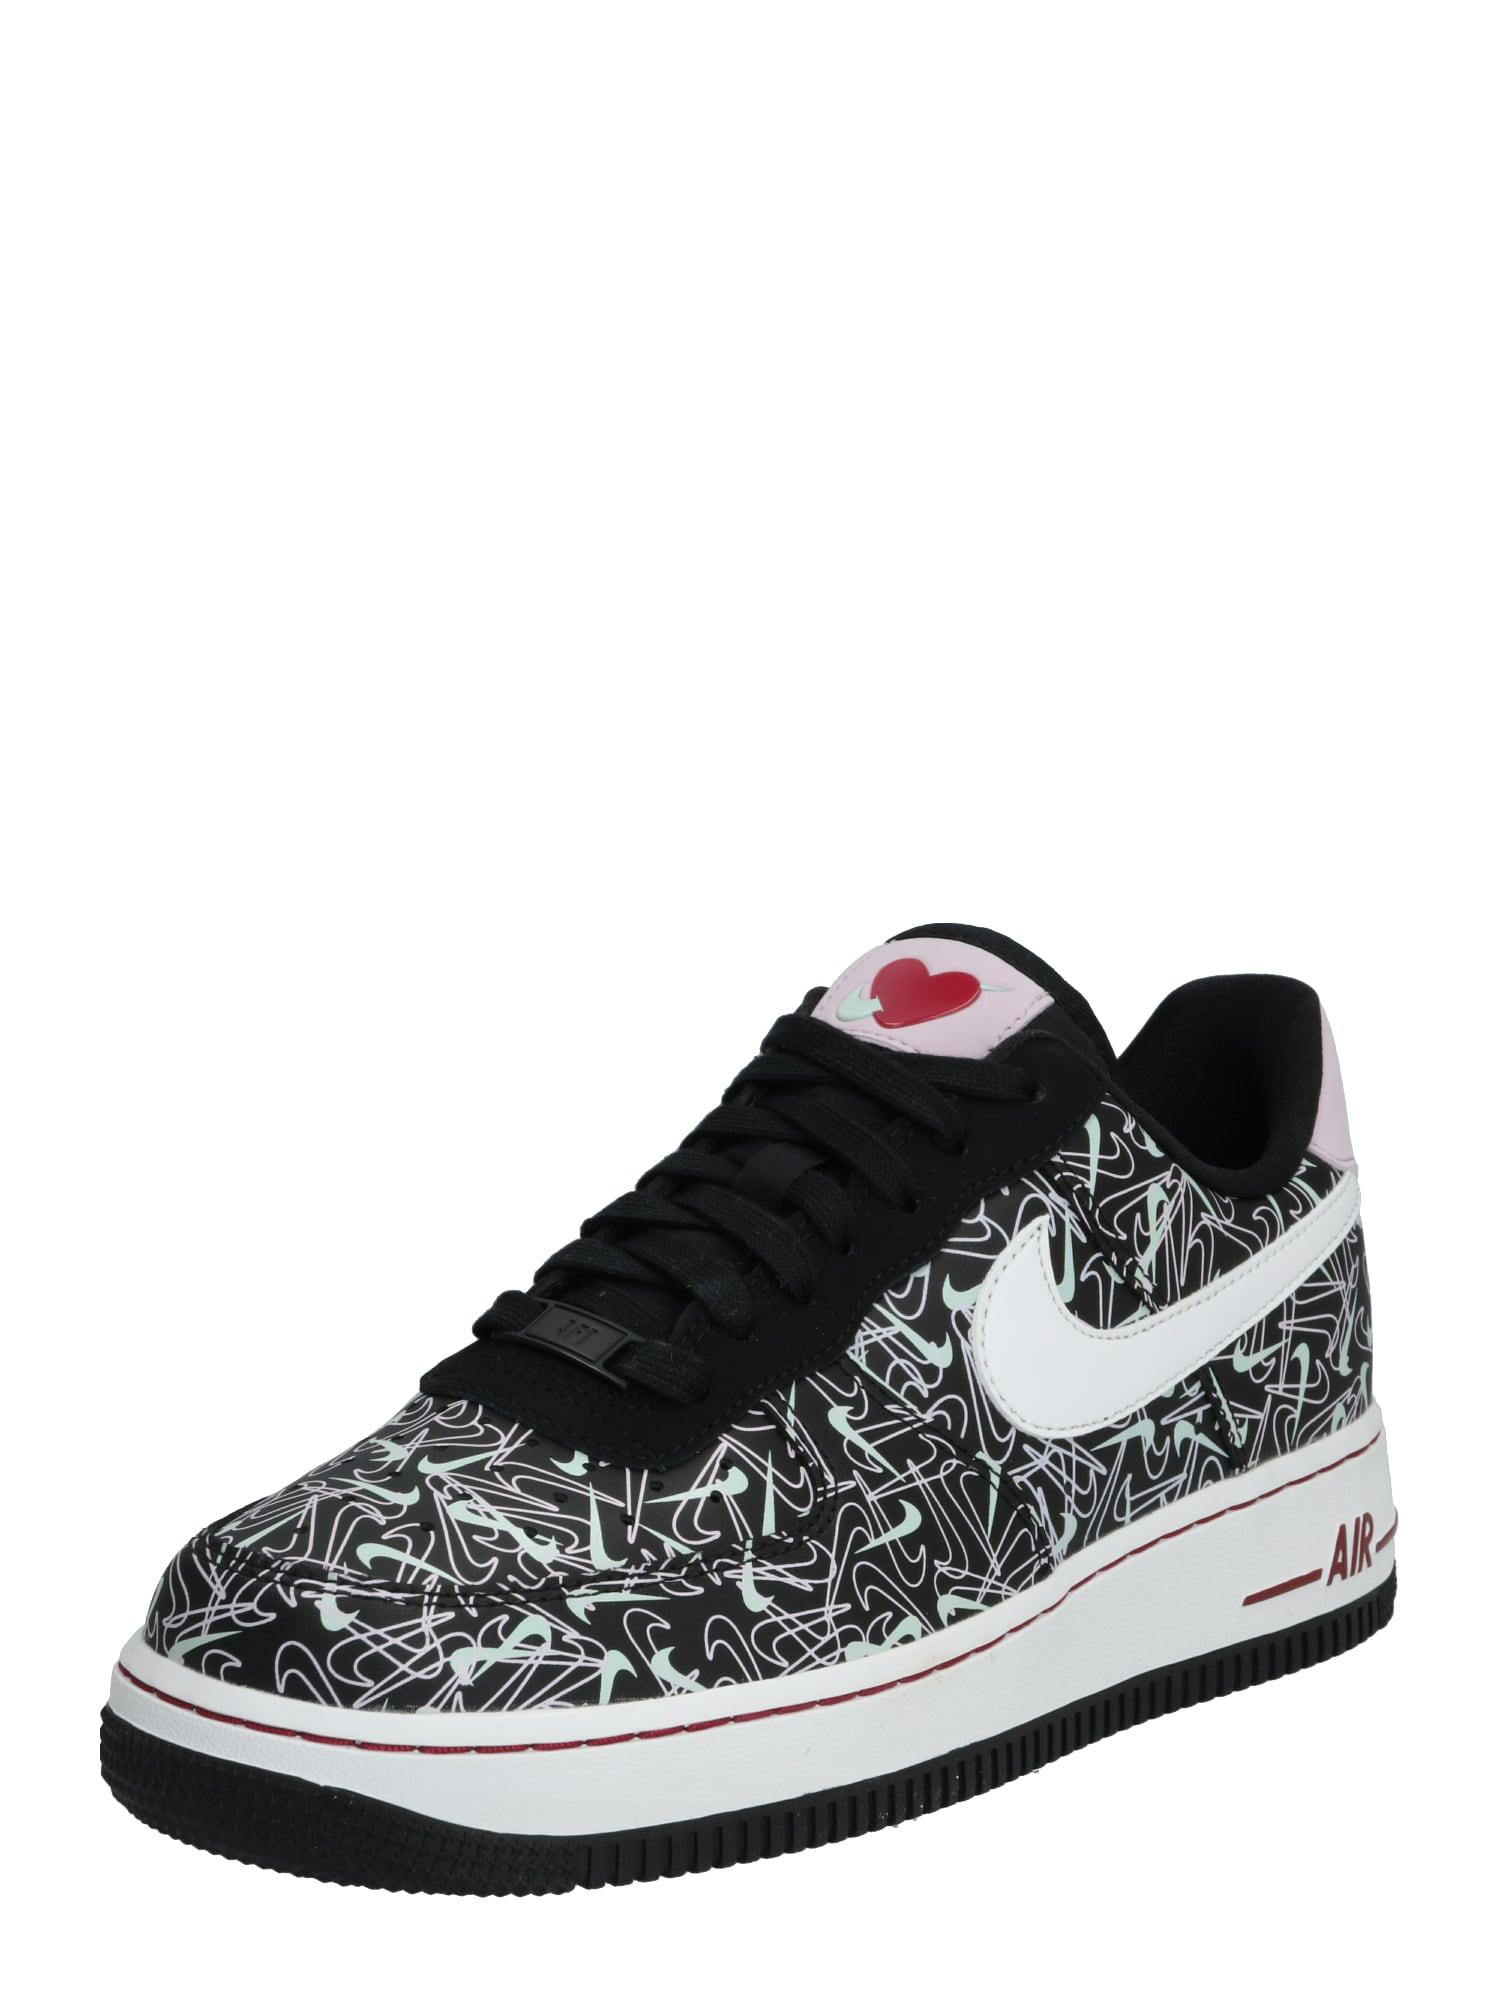 Nike Sportswear Nízke tenisky 'Air Force 1 '07 Premium SE'  biela / mätová / čierna